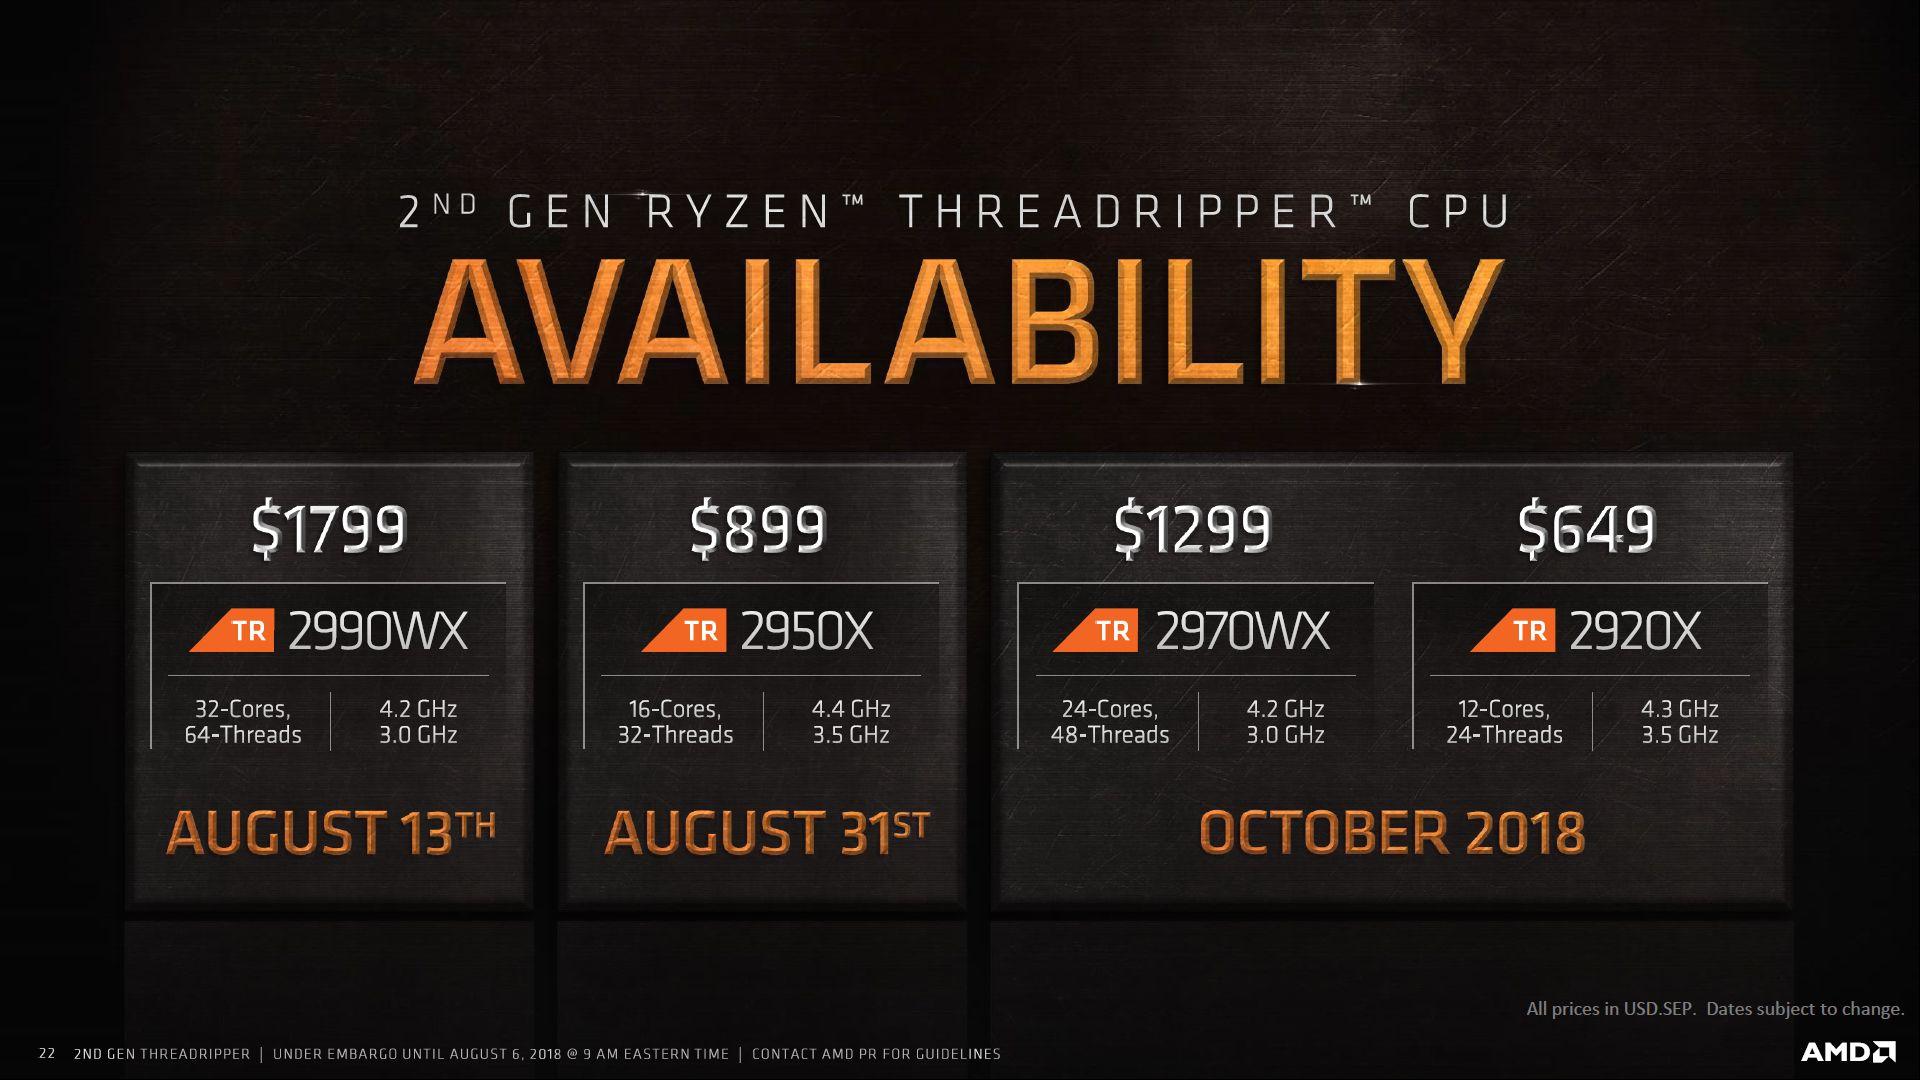 AMD Ryzen Threadripper 2000